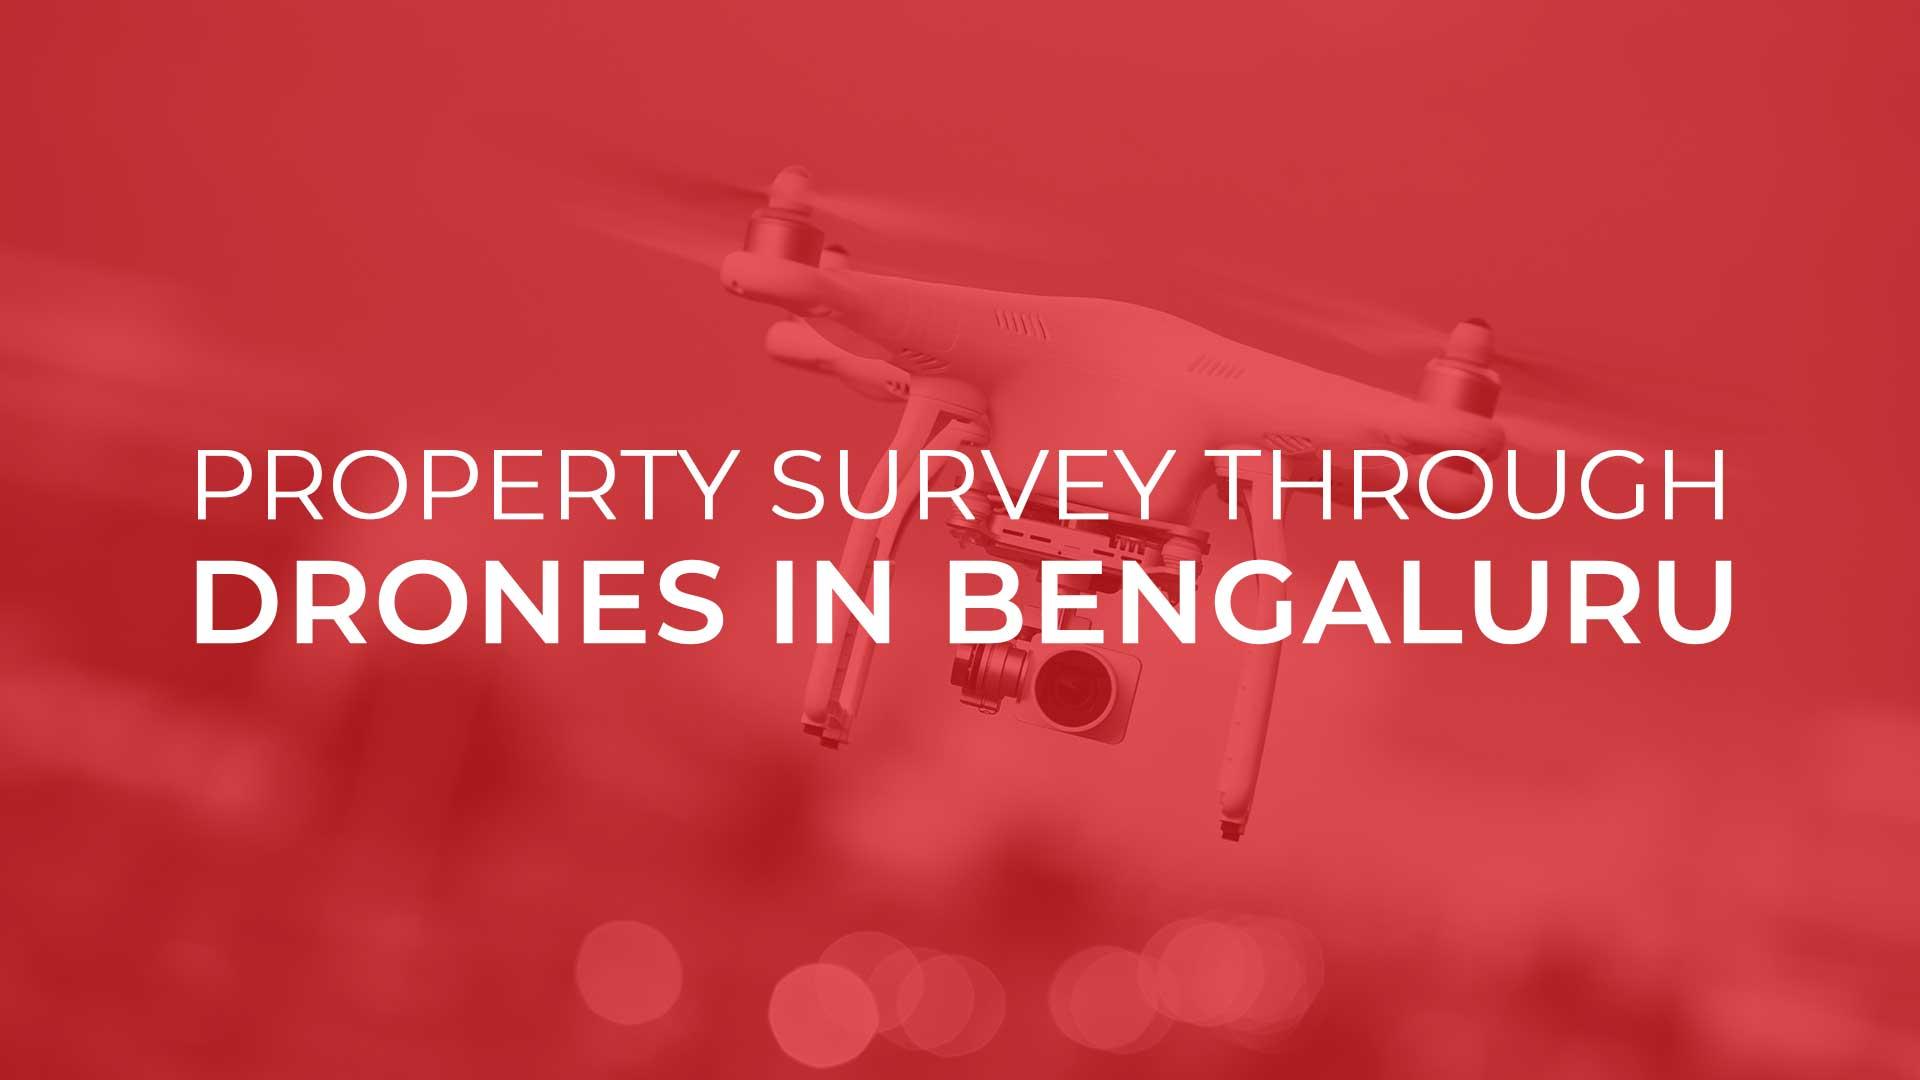 Property Survey In Bengaluru's Jayanagar Ward Done Through Drones